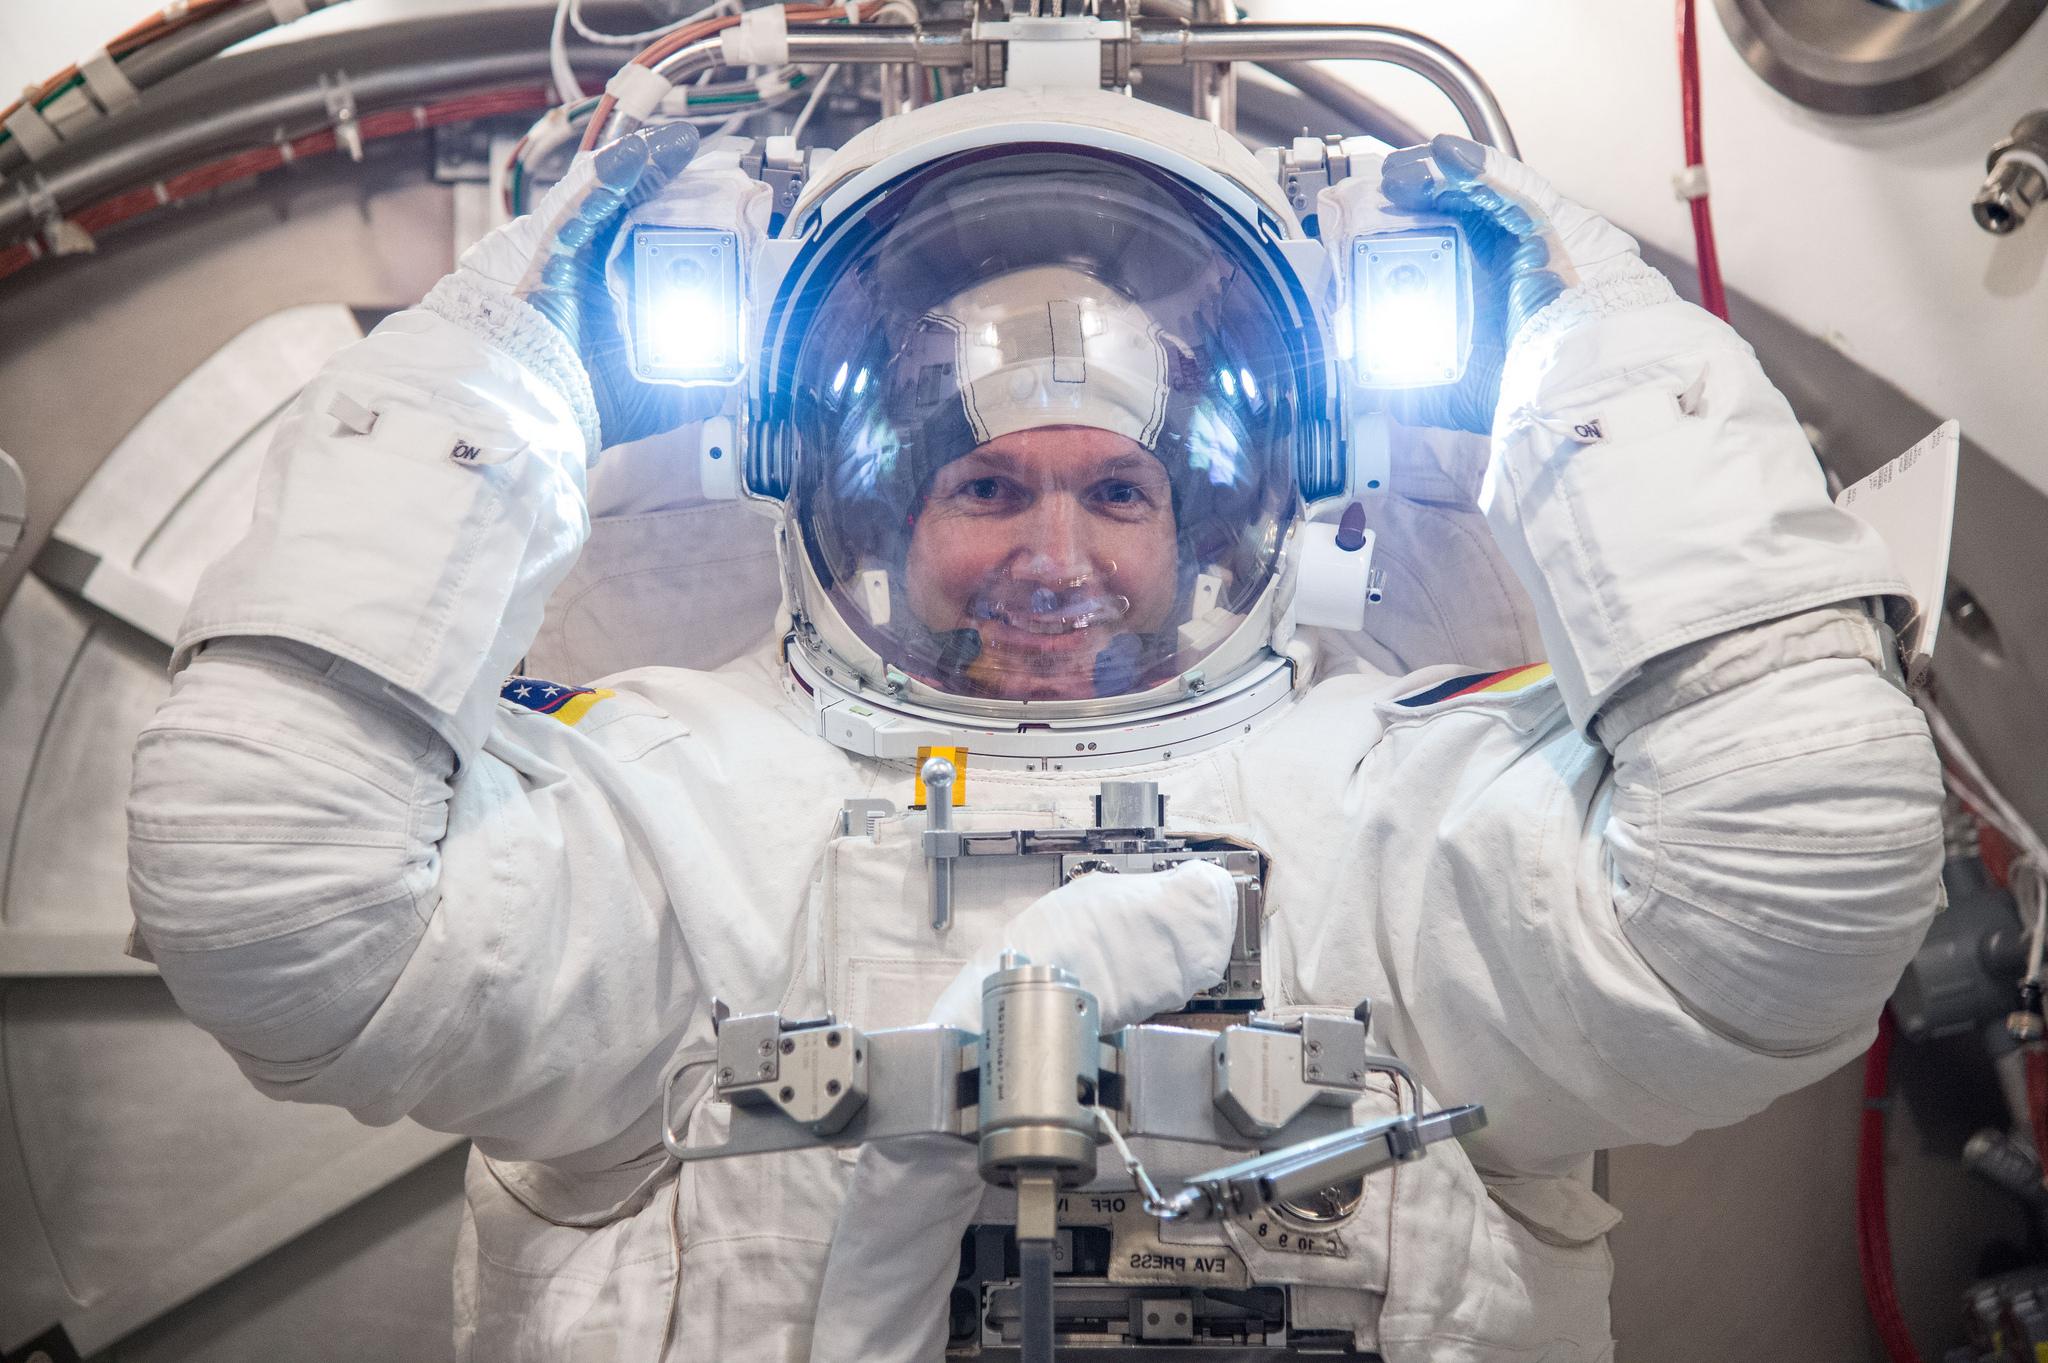 Image: Alexander Gerst spacesuit check at NASA